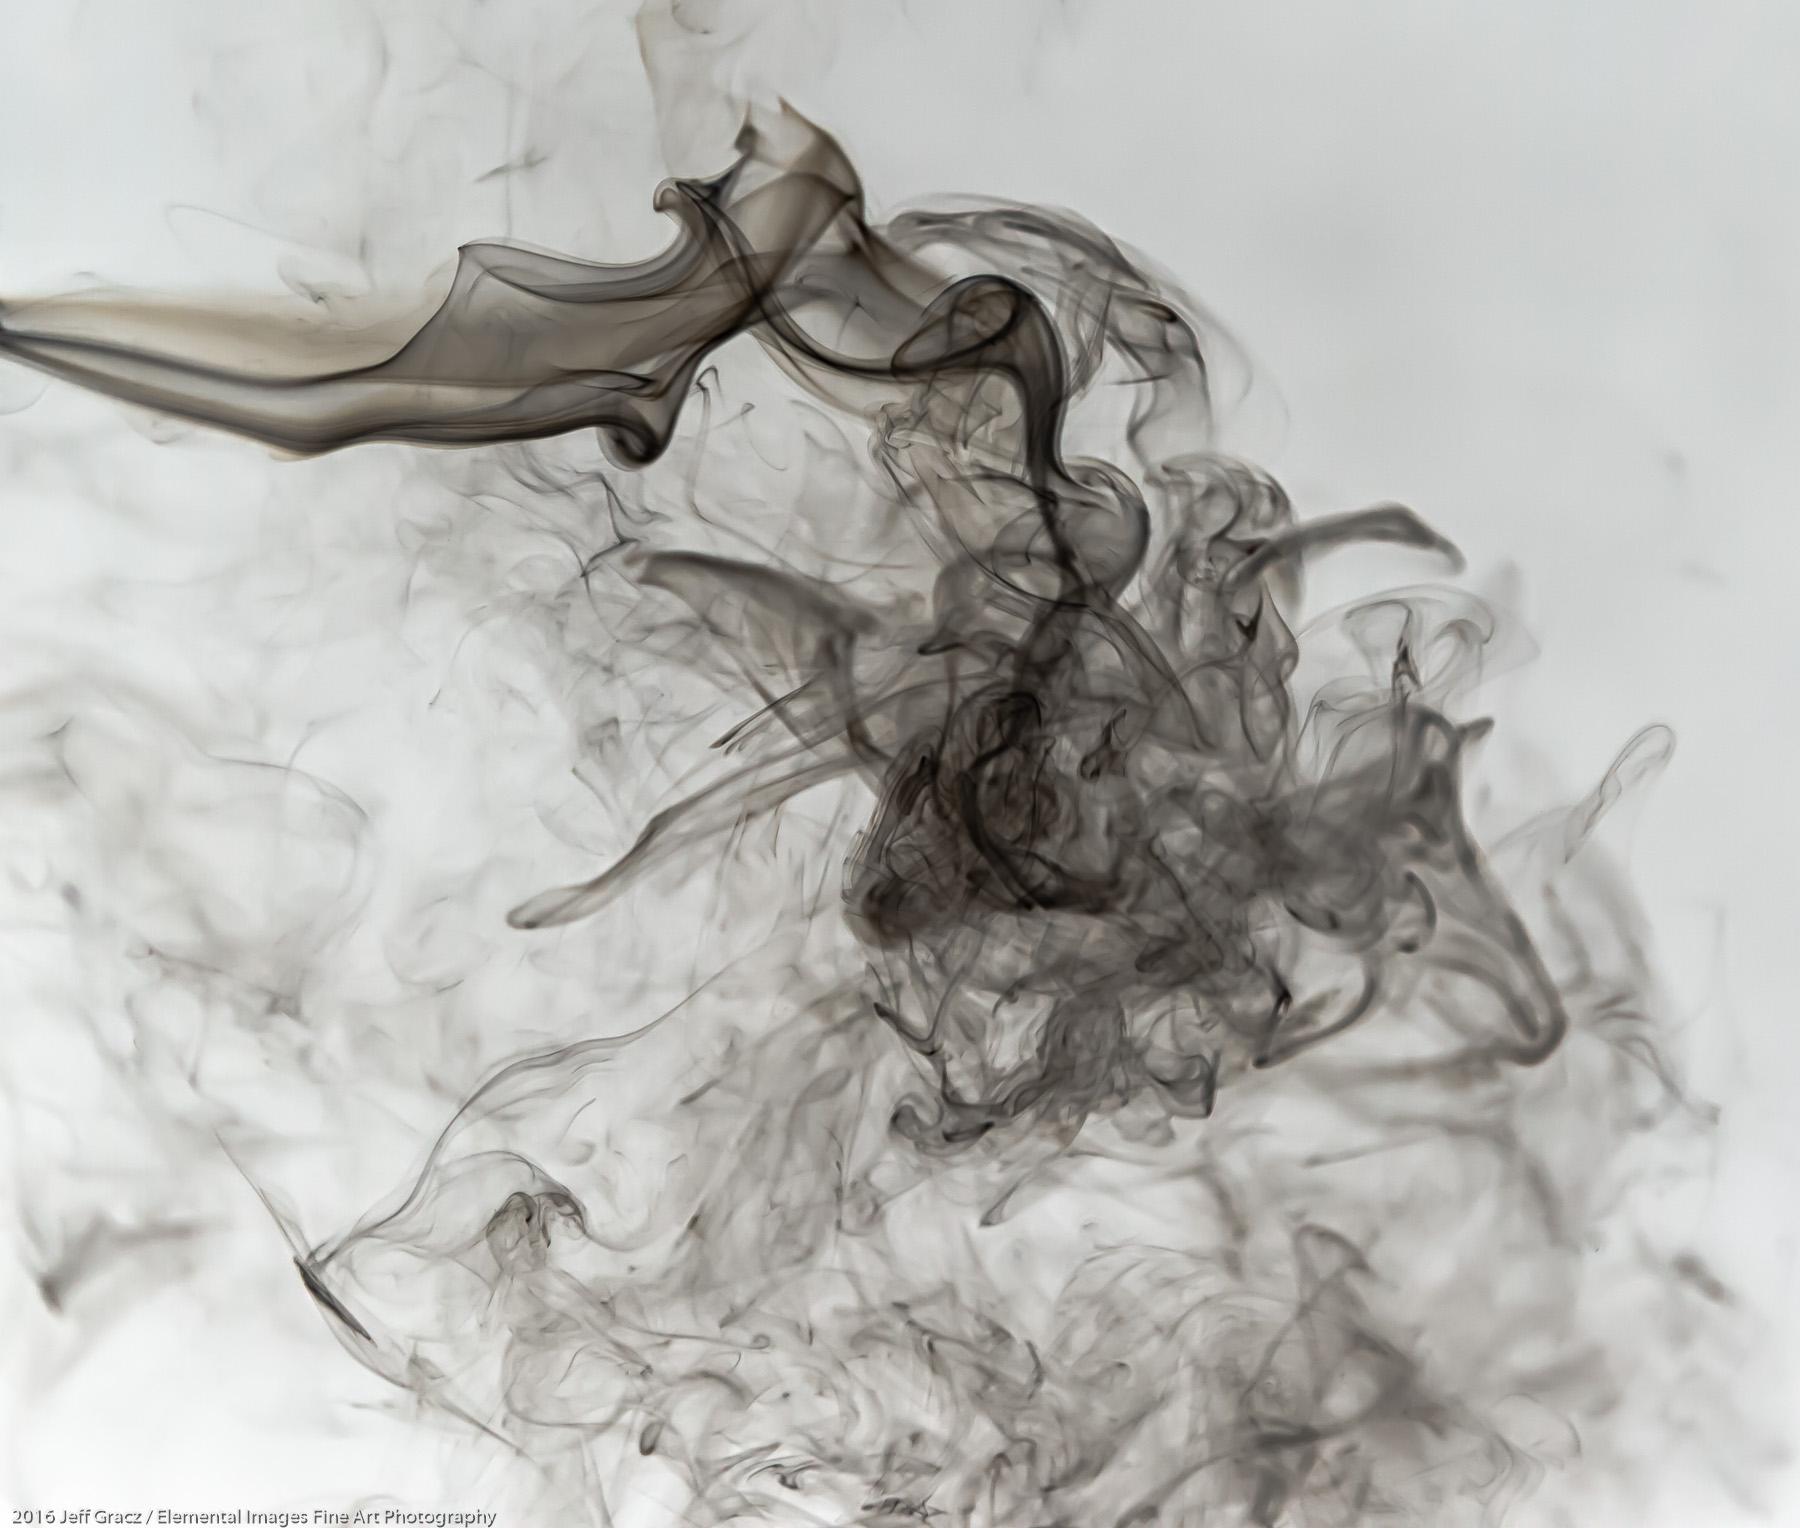 Smoke 36   Vancouver   WA   USA - © 2016 Jeff Gracz / Elemental Images Fine Art Photography - All Rights Reserved Worldwide